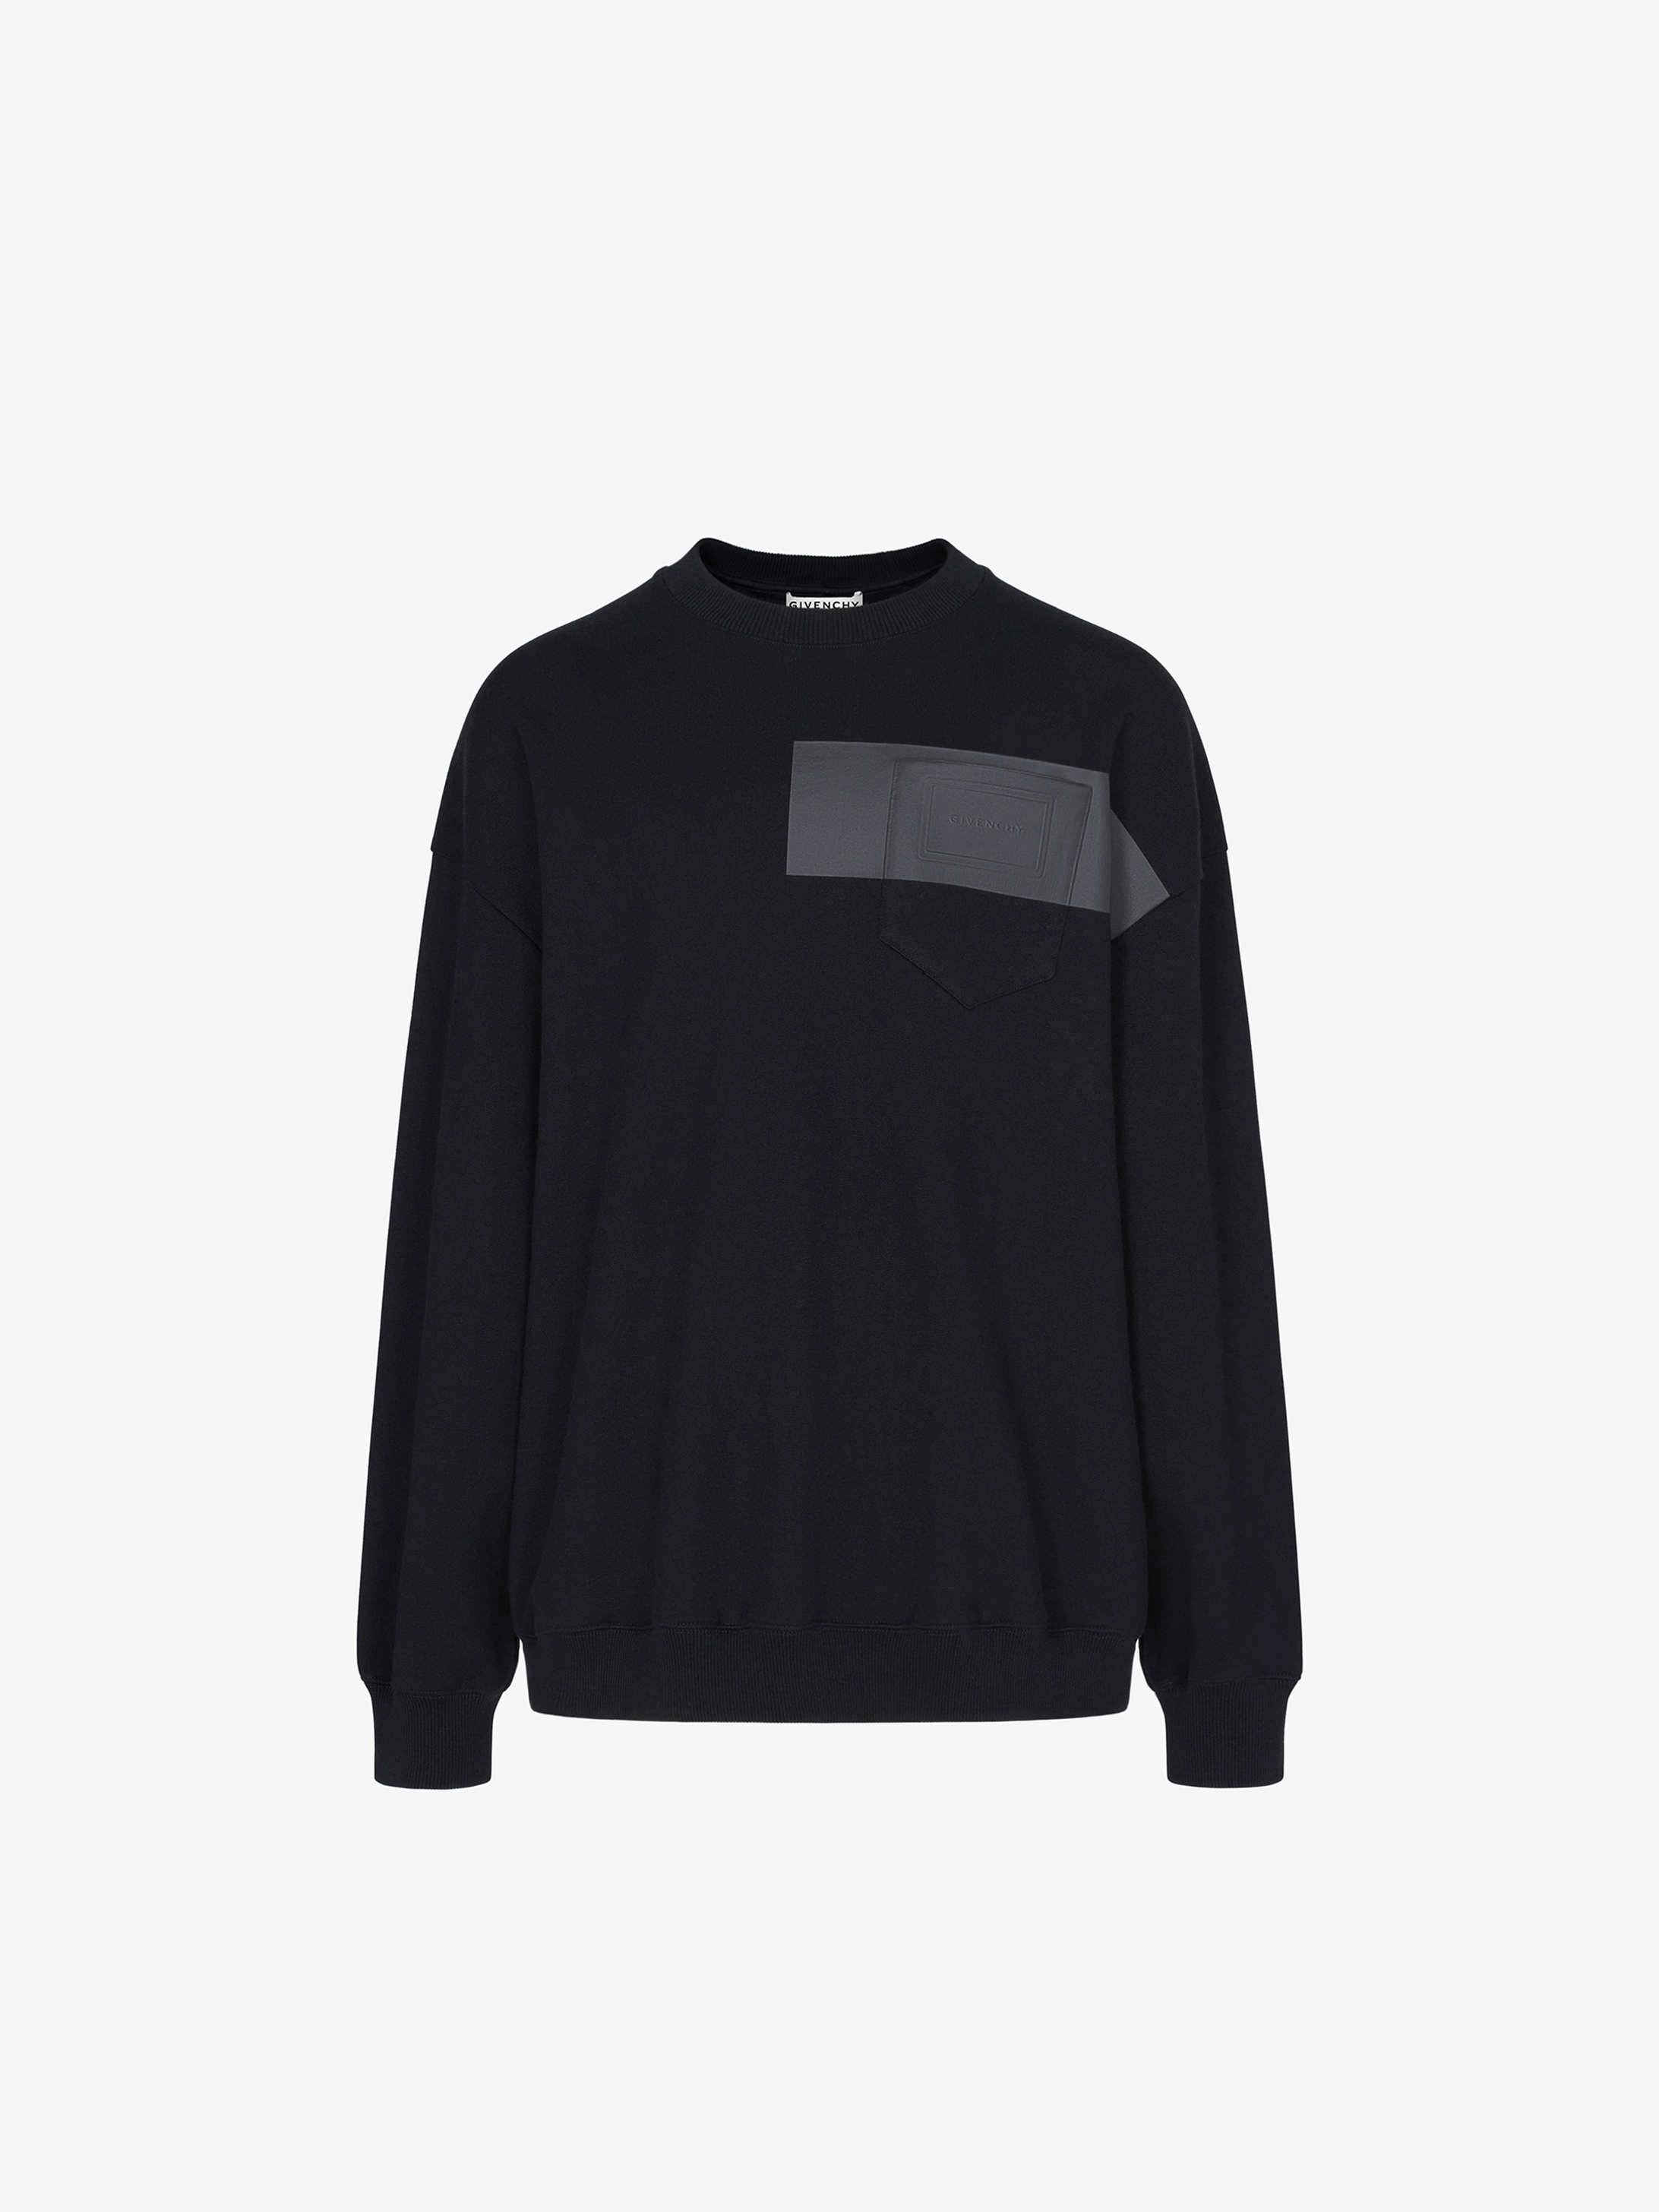 GIVENCHY PATCH oversized sweatshirt